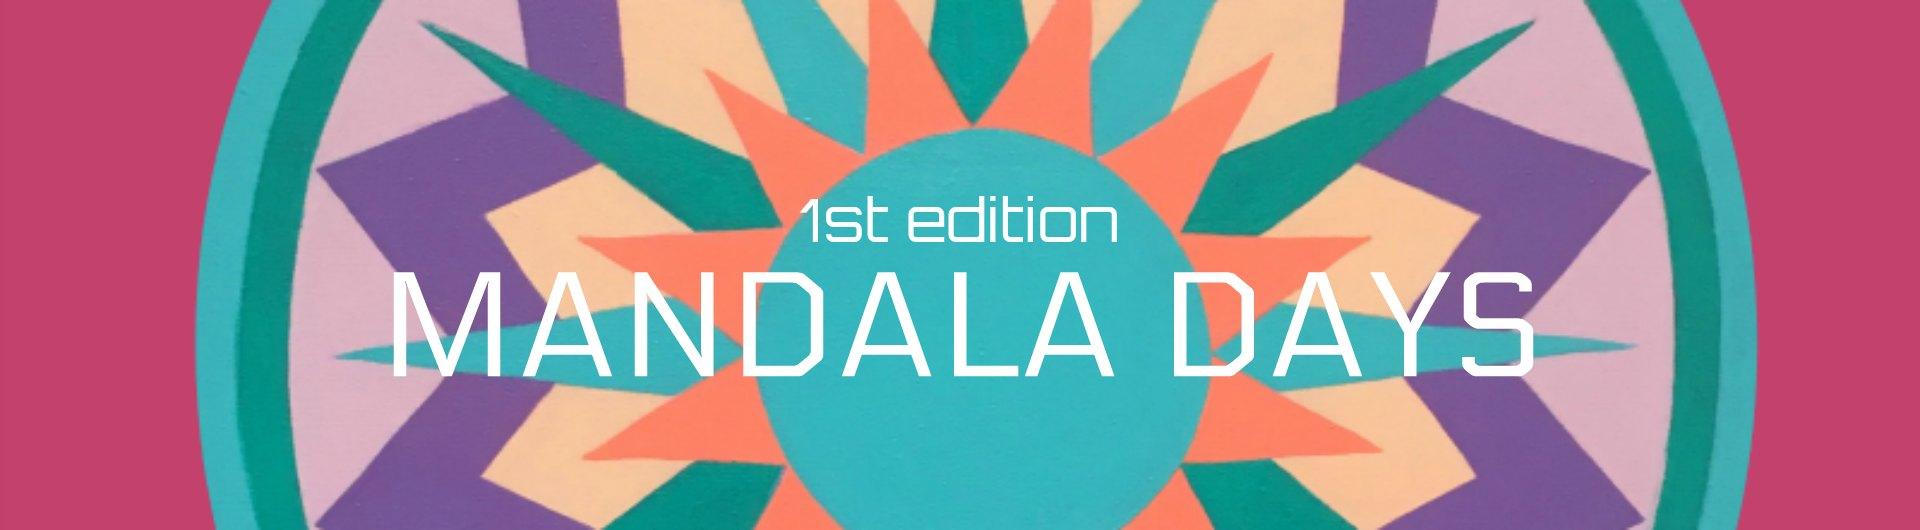 Mandala Days 1st Edition Banner Lo Res